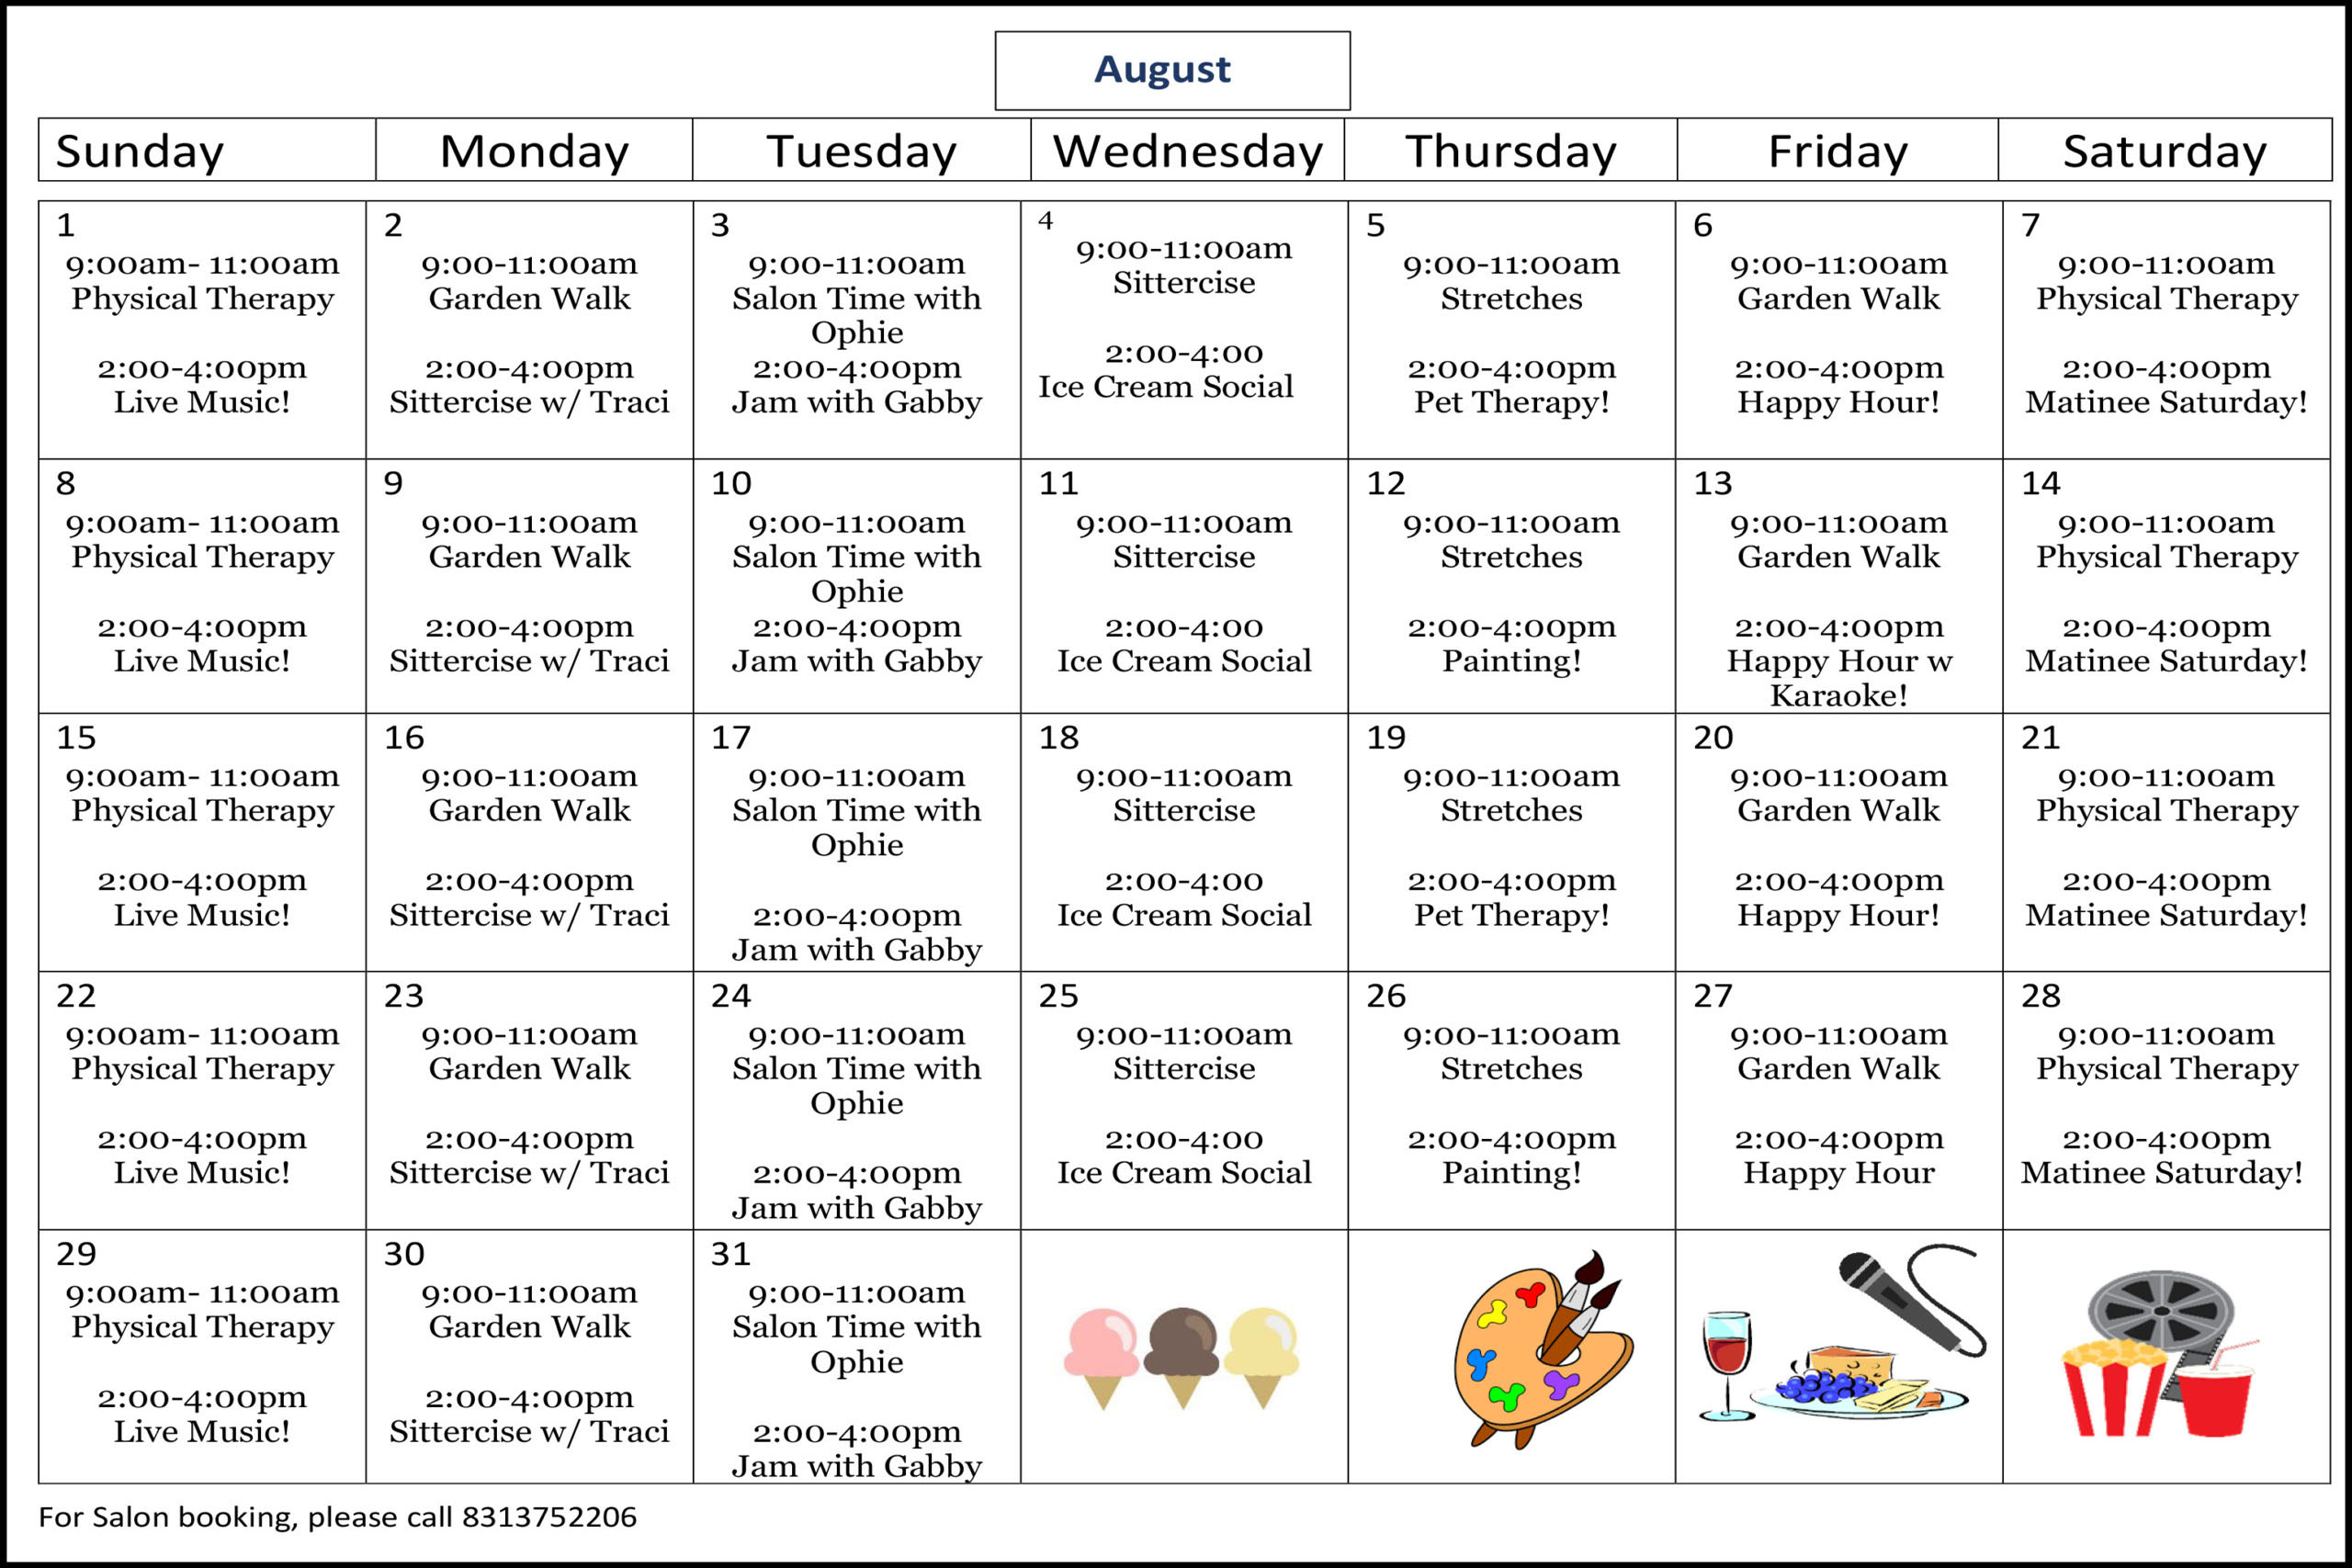 ActivitiesCalendar_August-1-scaled copy